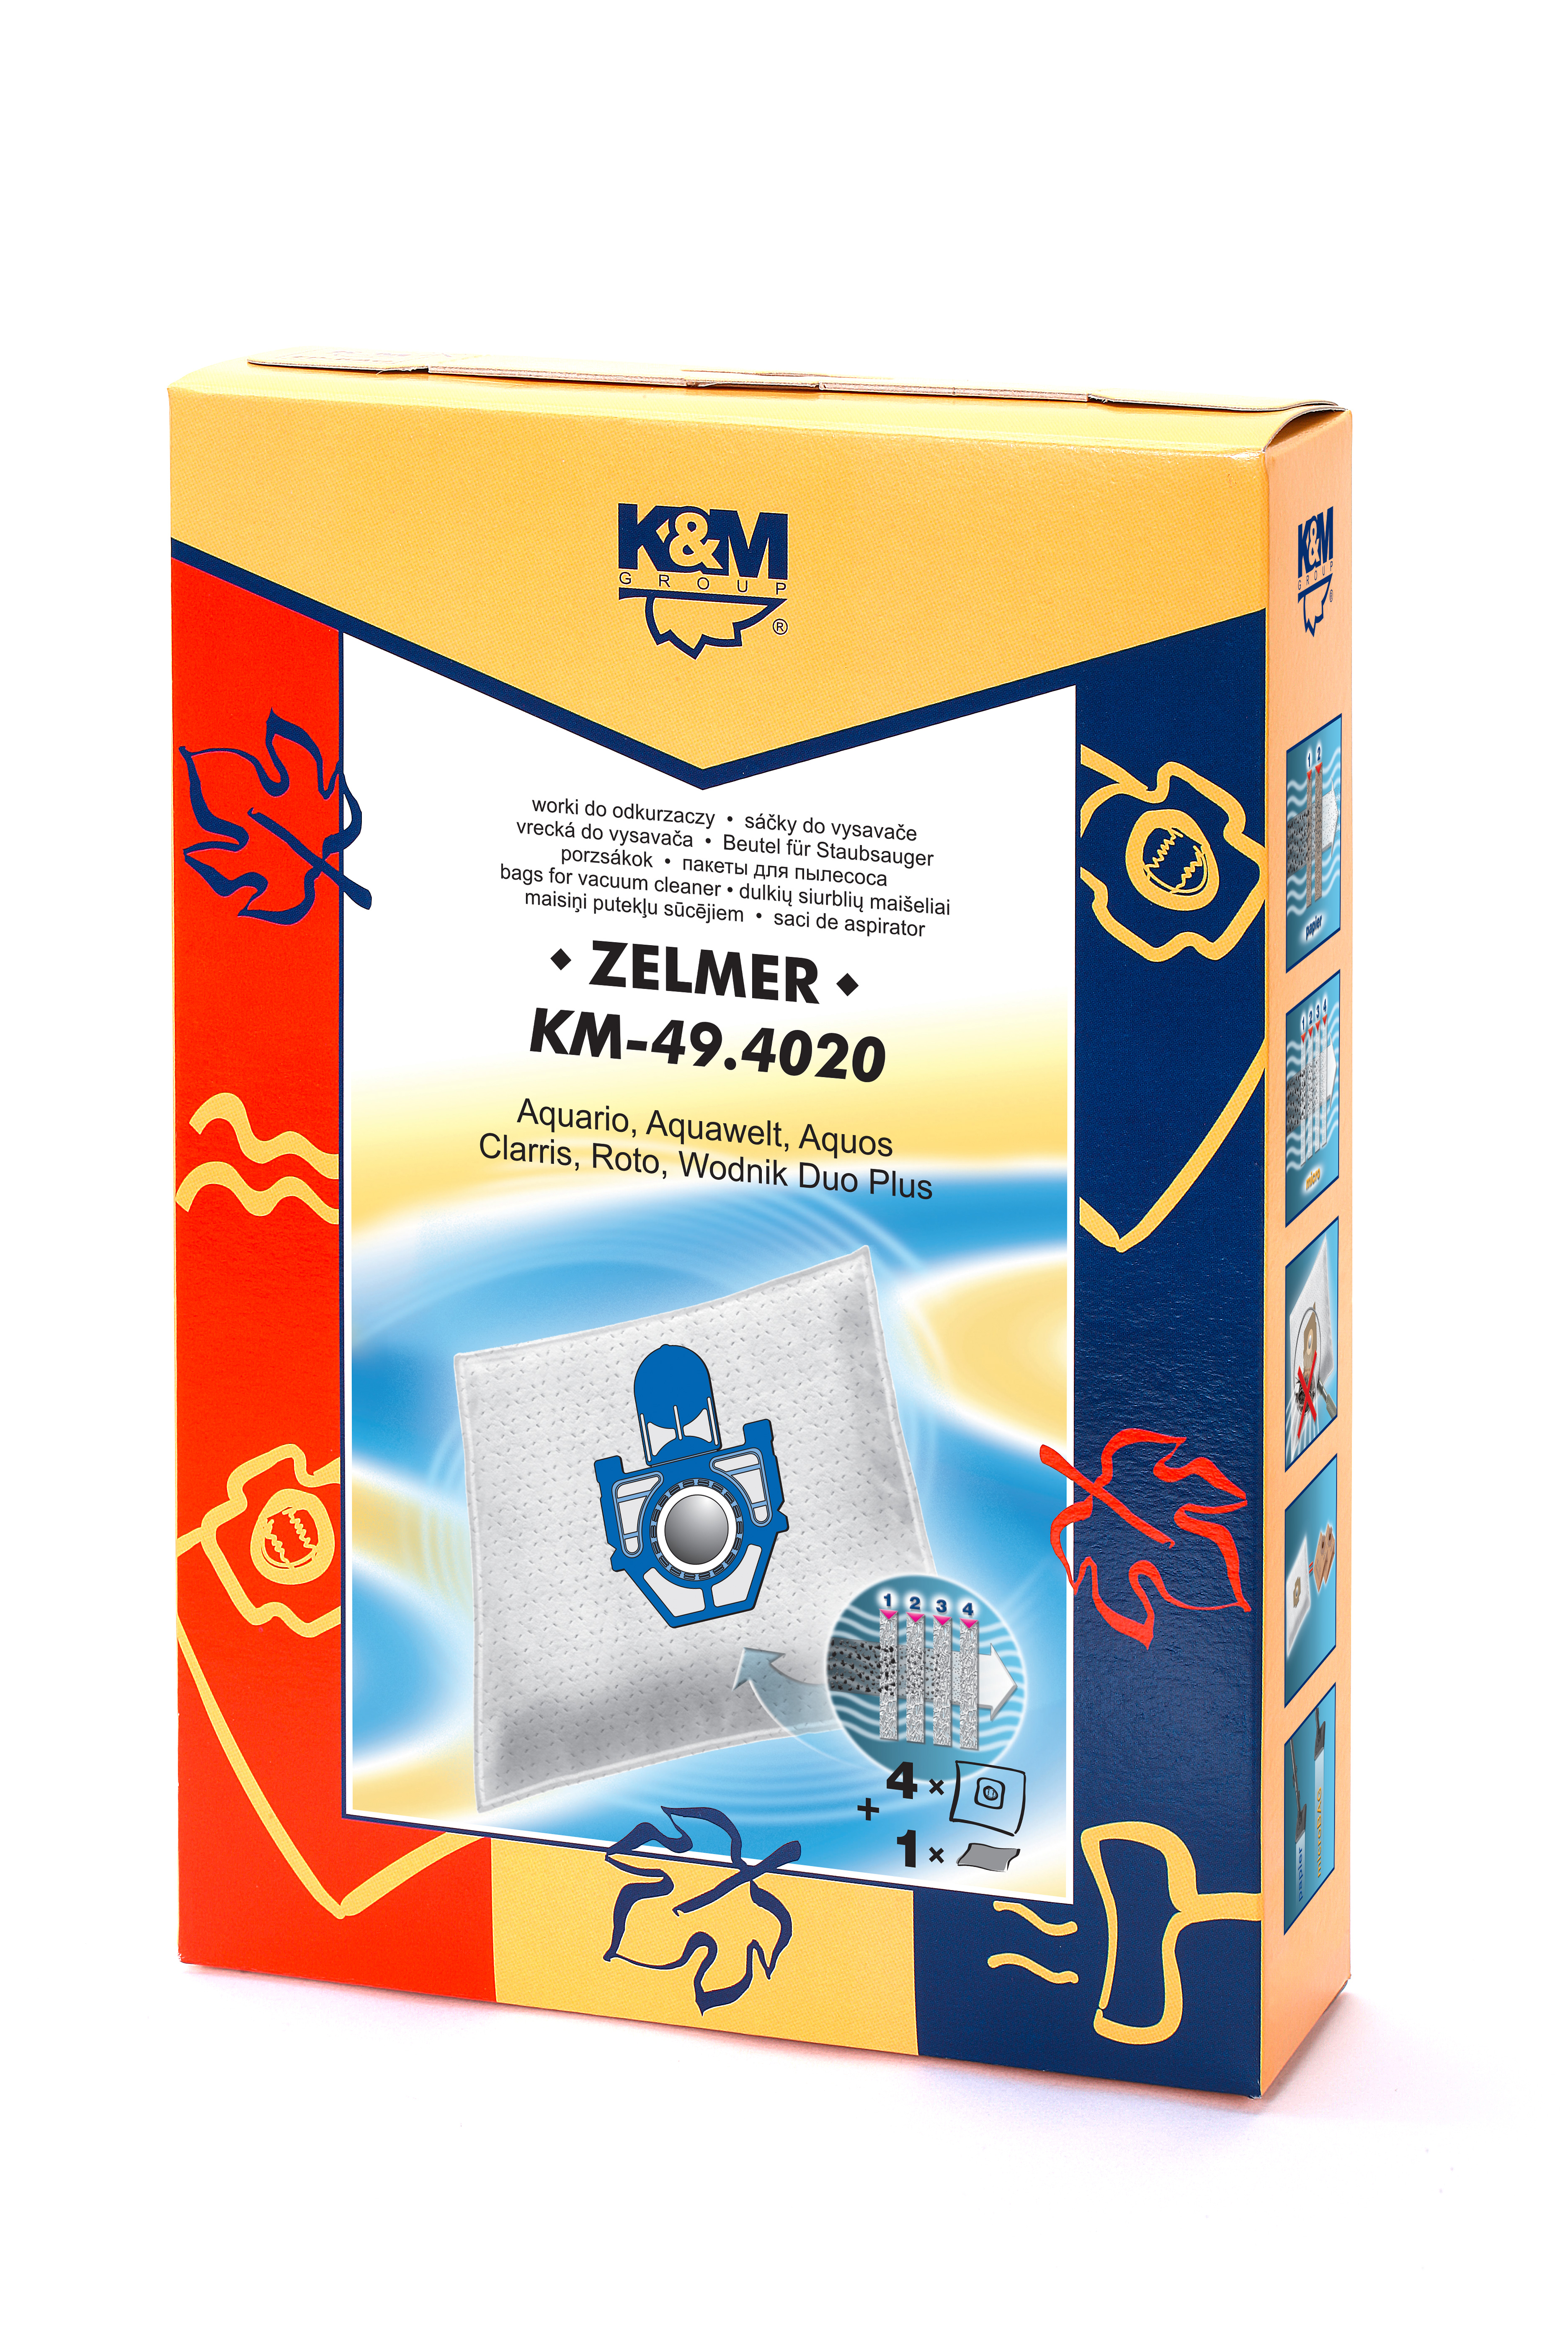 Sac aspirator pentru Zelmer, sintetic, 4 saci + 1 filtru, K&M 0